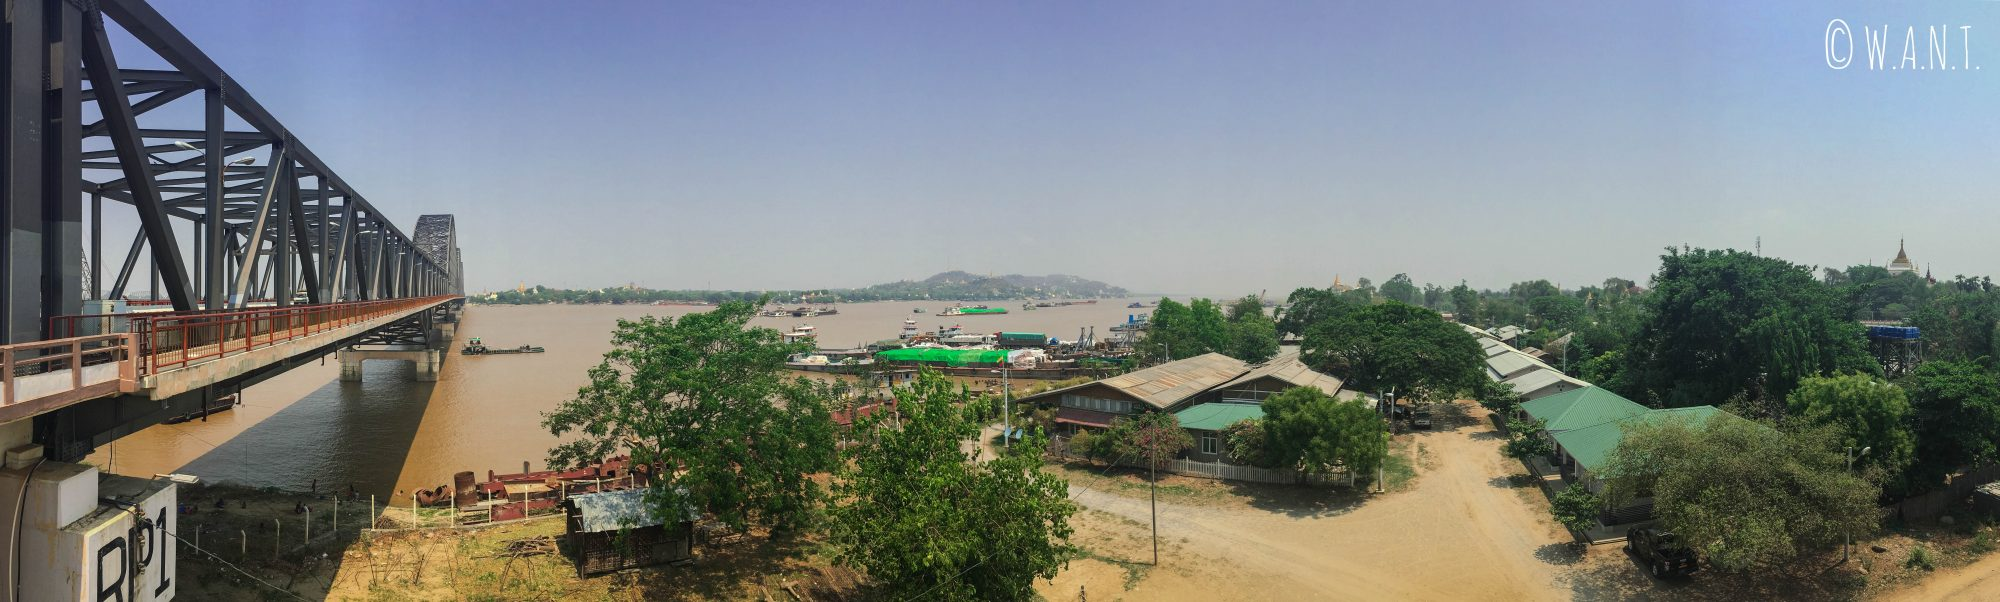 Pont de Sagaing et Irrawaddy